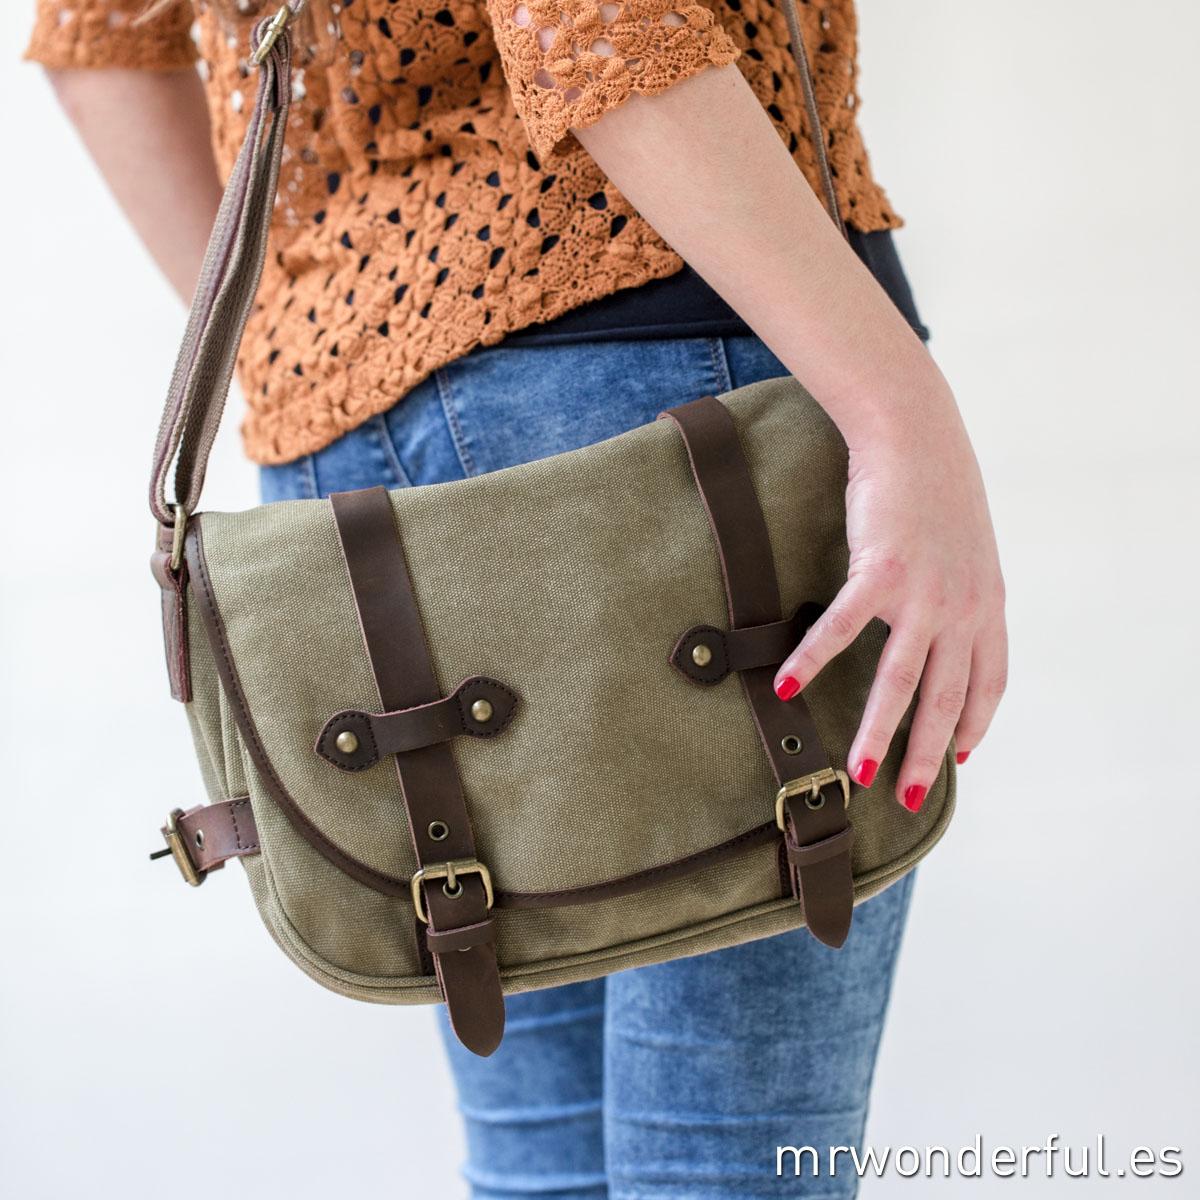 mrwonderful_bags_8050-1-Olive-57